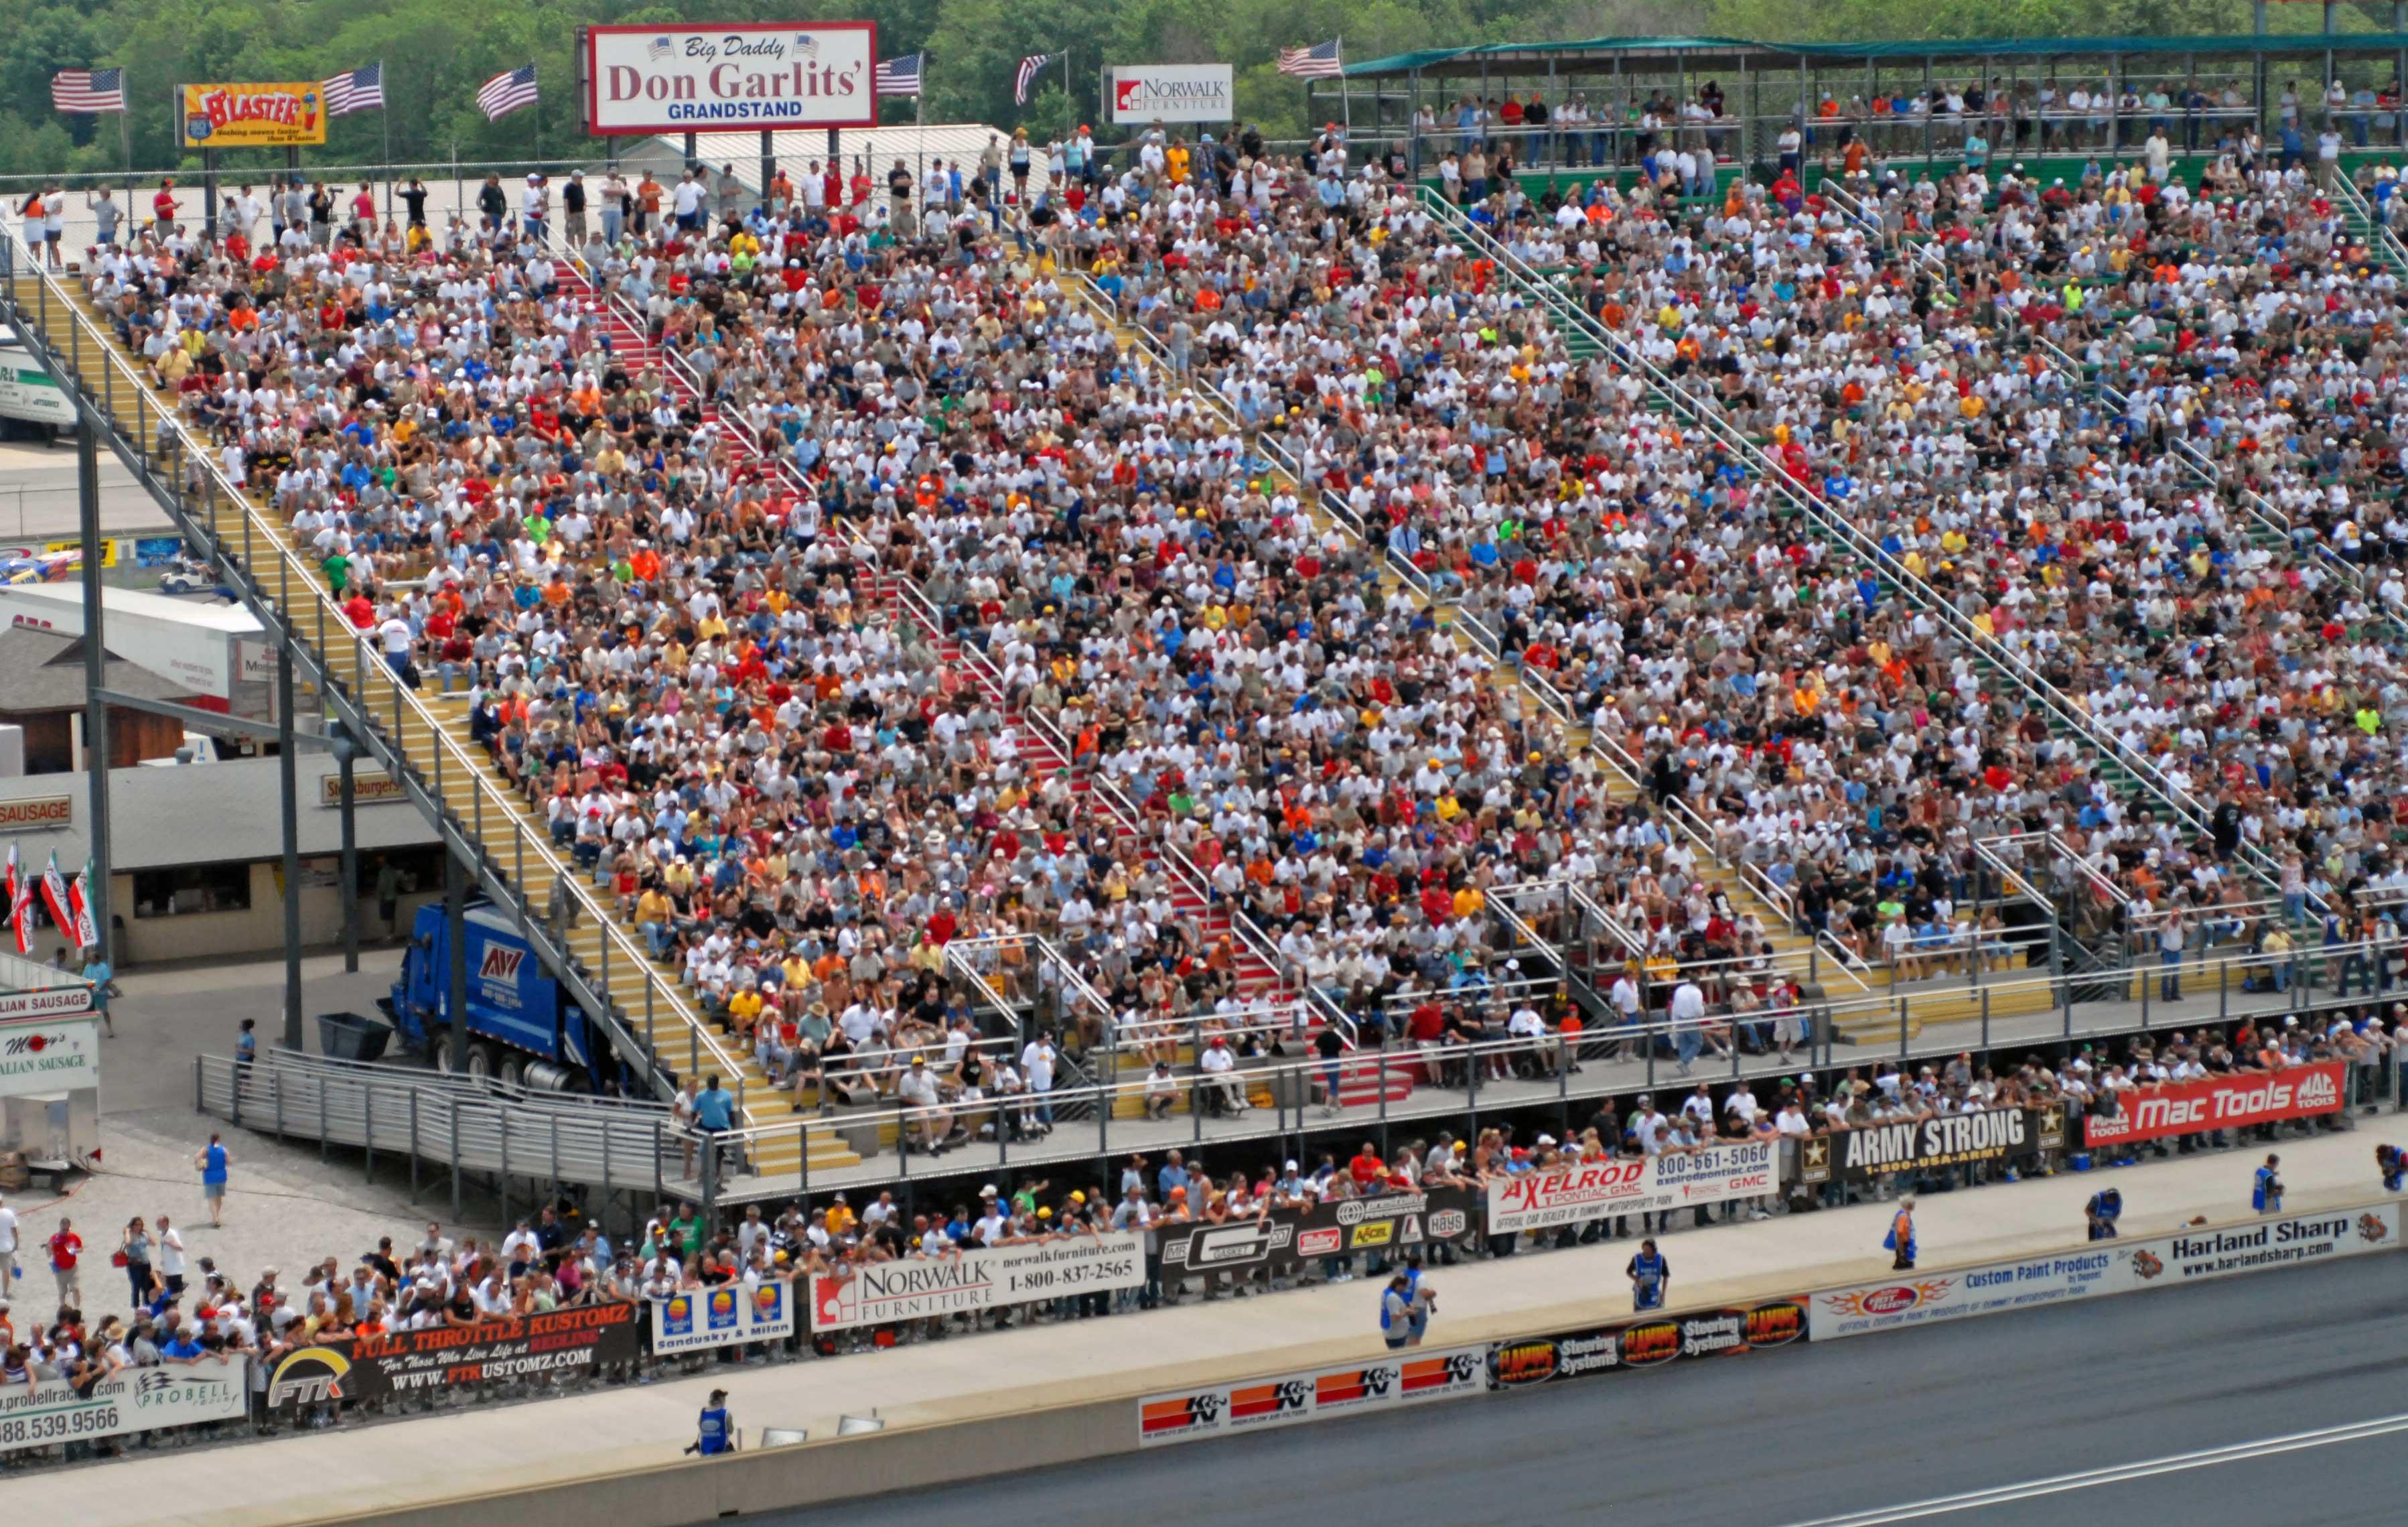 Suite view at NHRA Summit Racing Equipment Nationals in Norwalk, Ohio